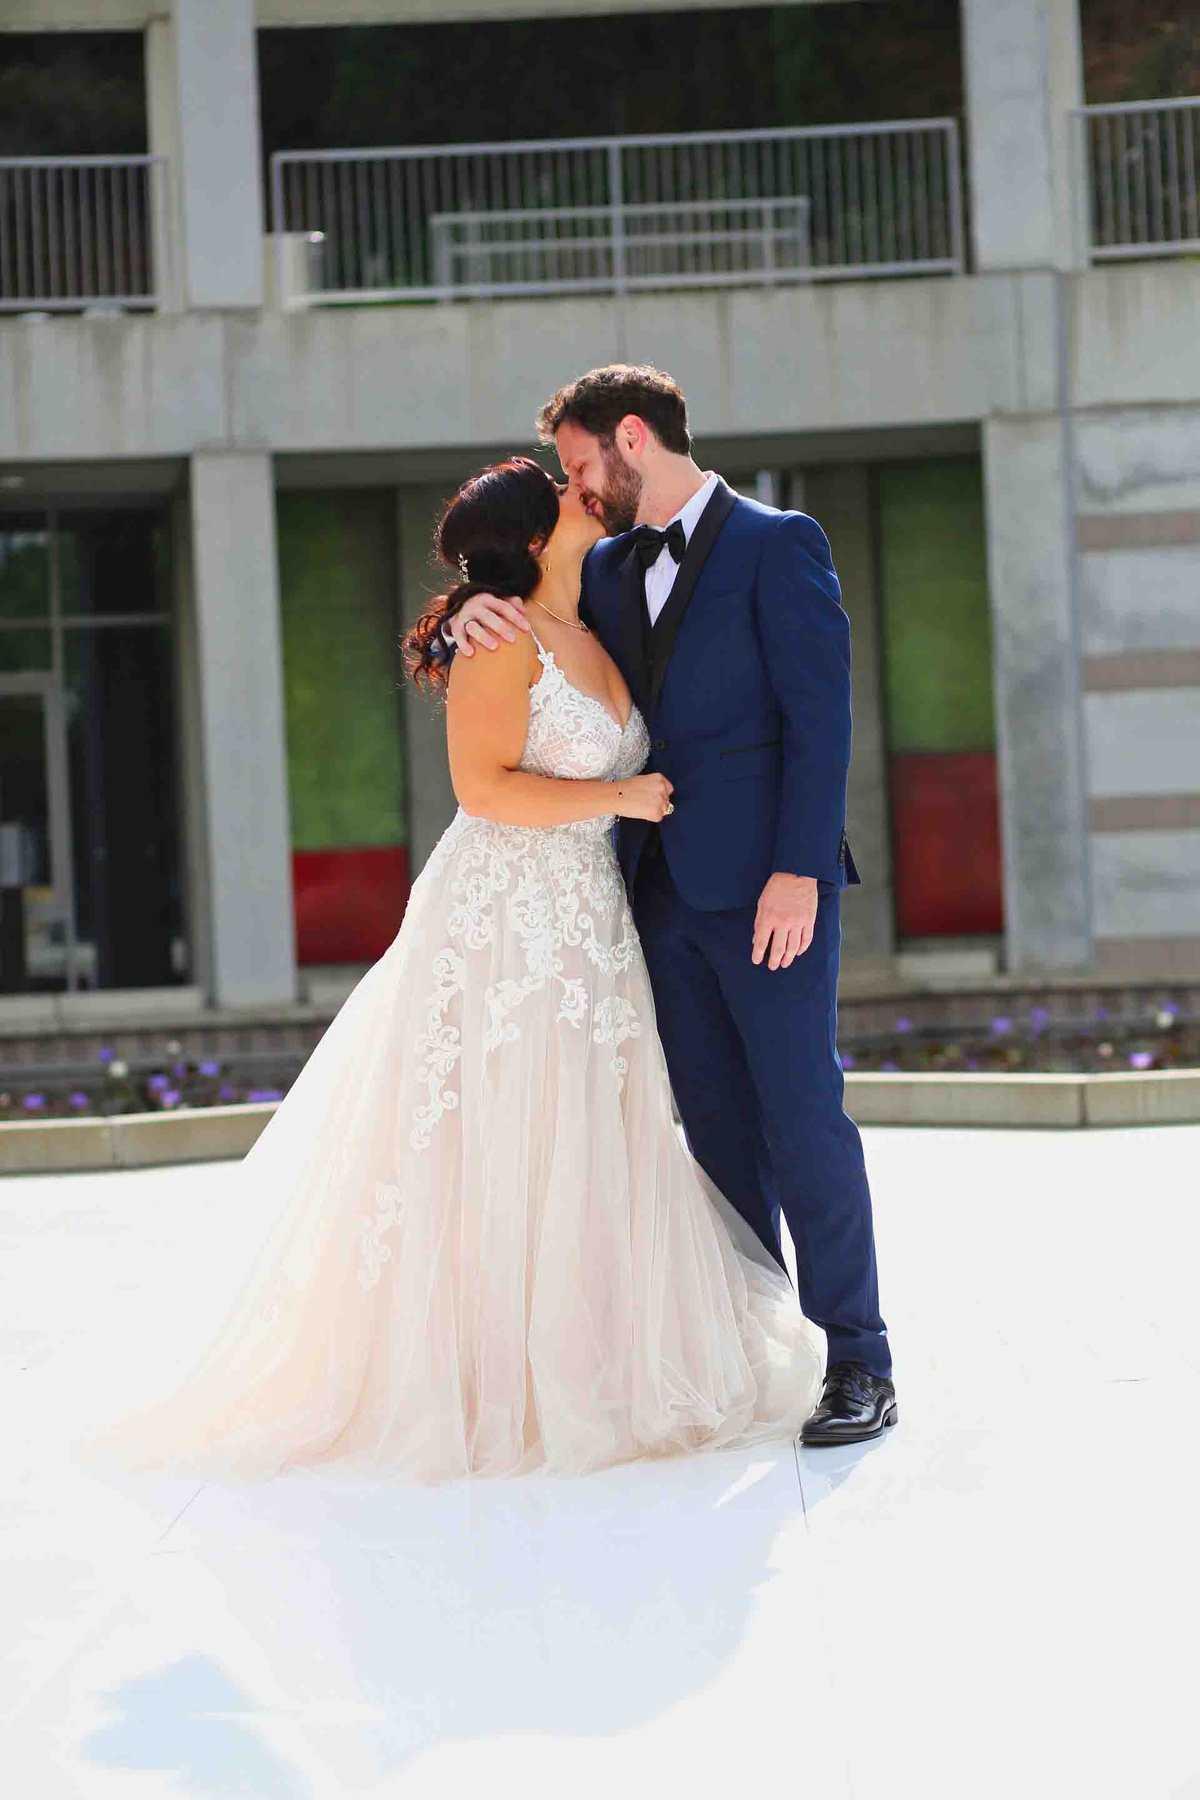 First look wedding kiss